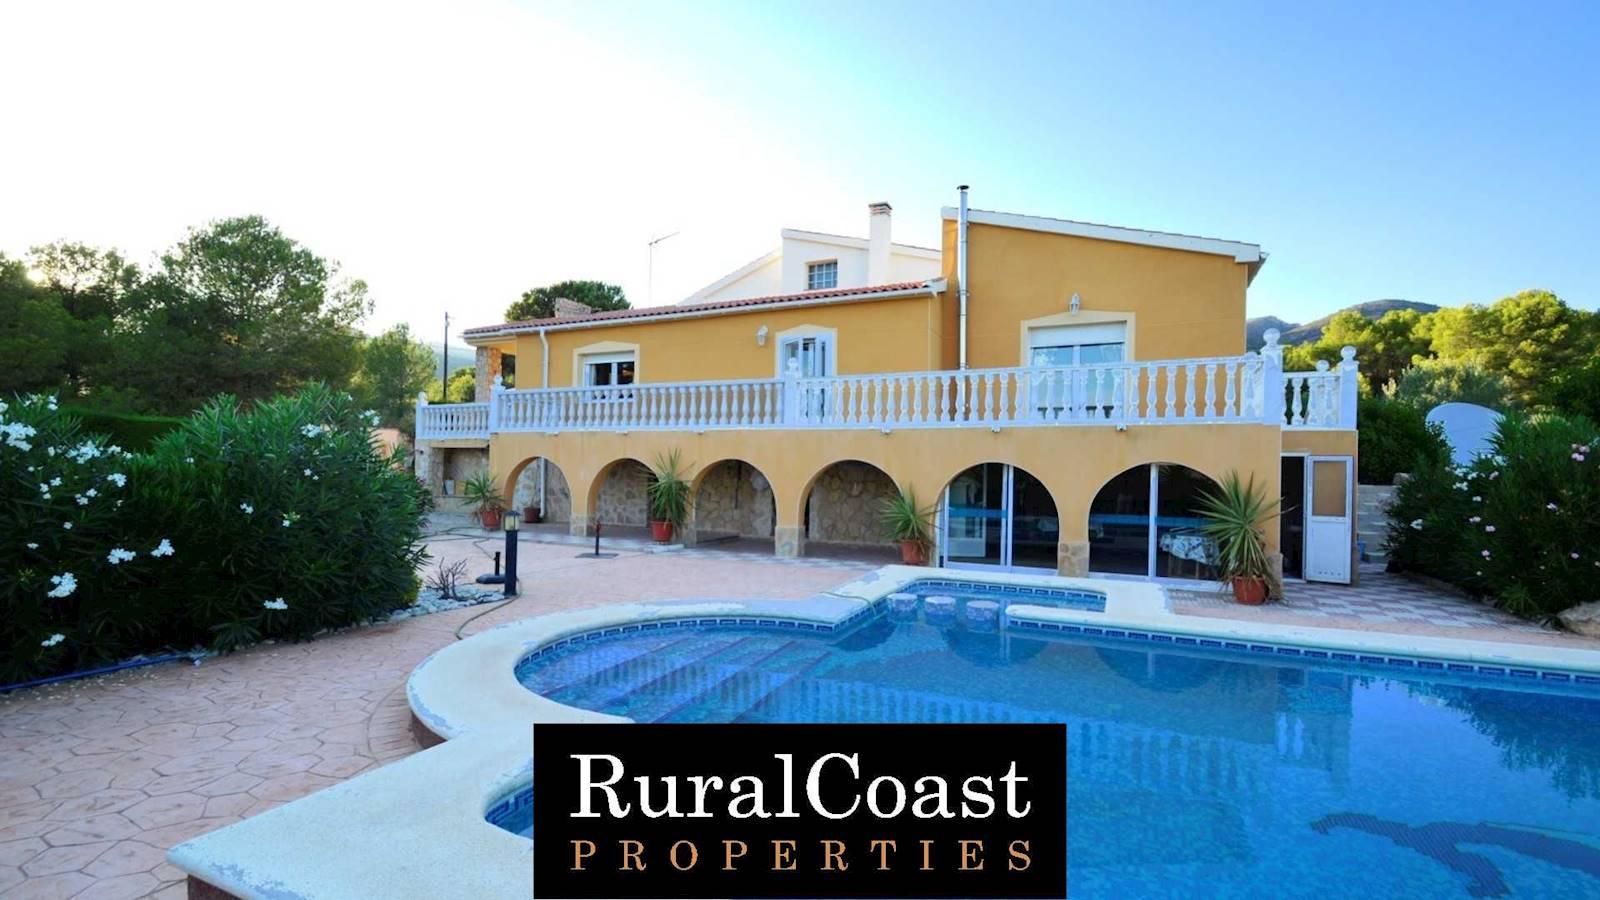 4 bedroom Villa for sale in Torremanzanas with pool - € 440,000 (Ref: 3386661)